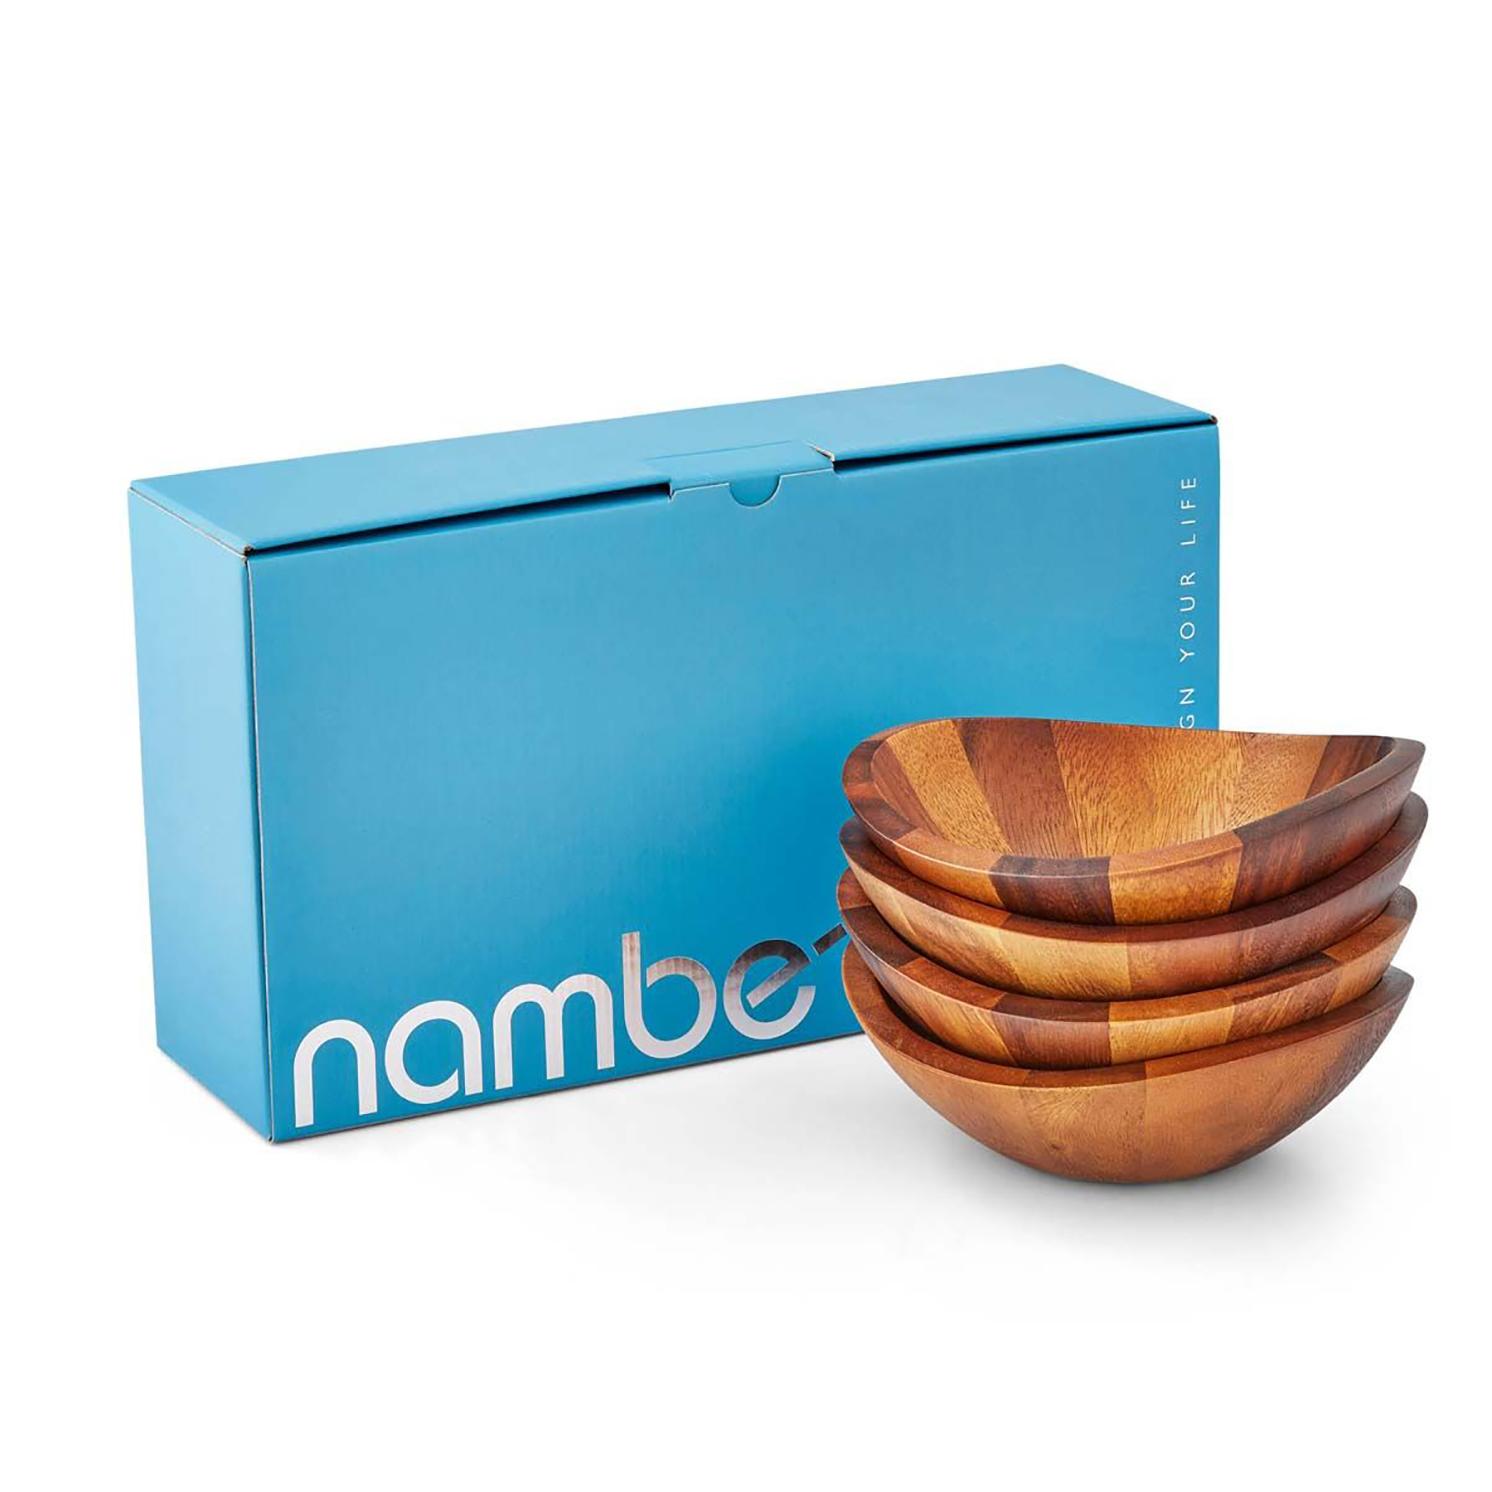 Nambe – Braid 4 Piece Salad Bowls Set in Gift Box